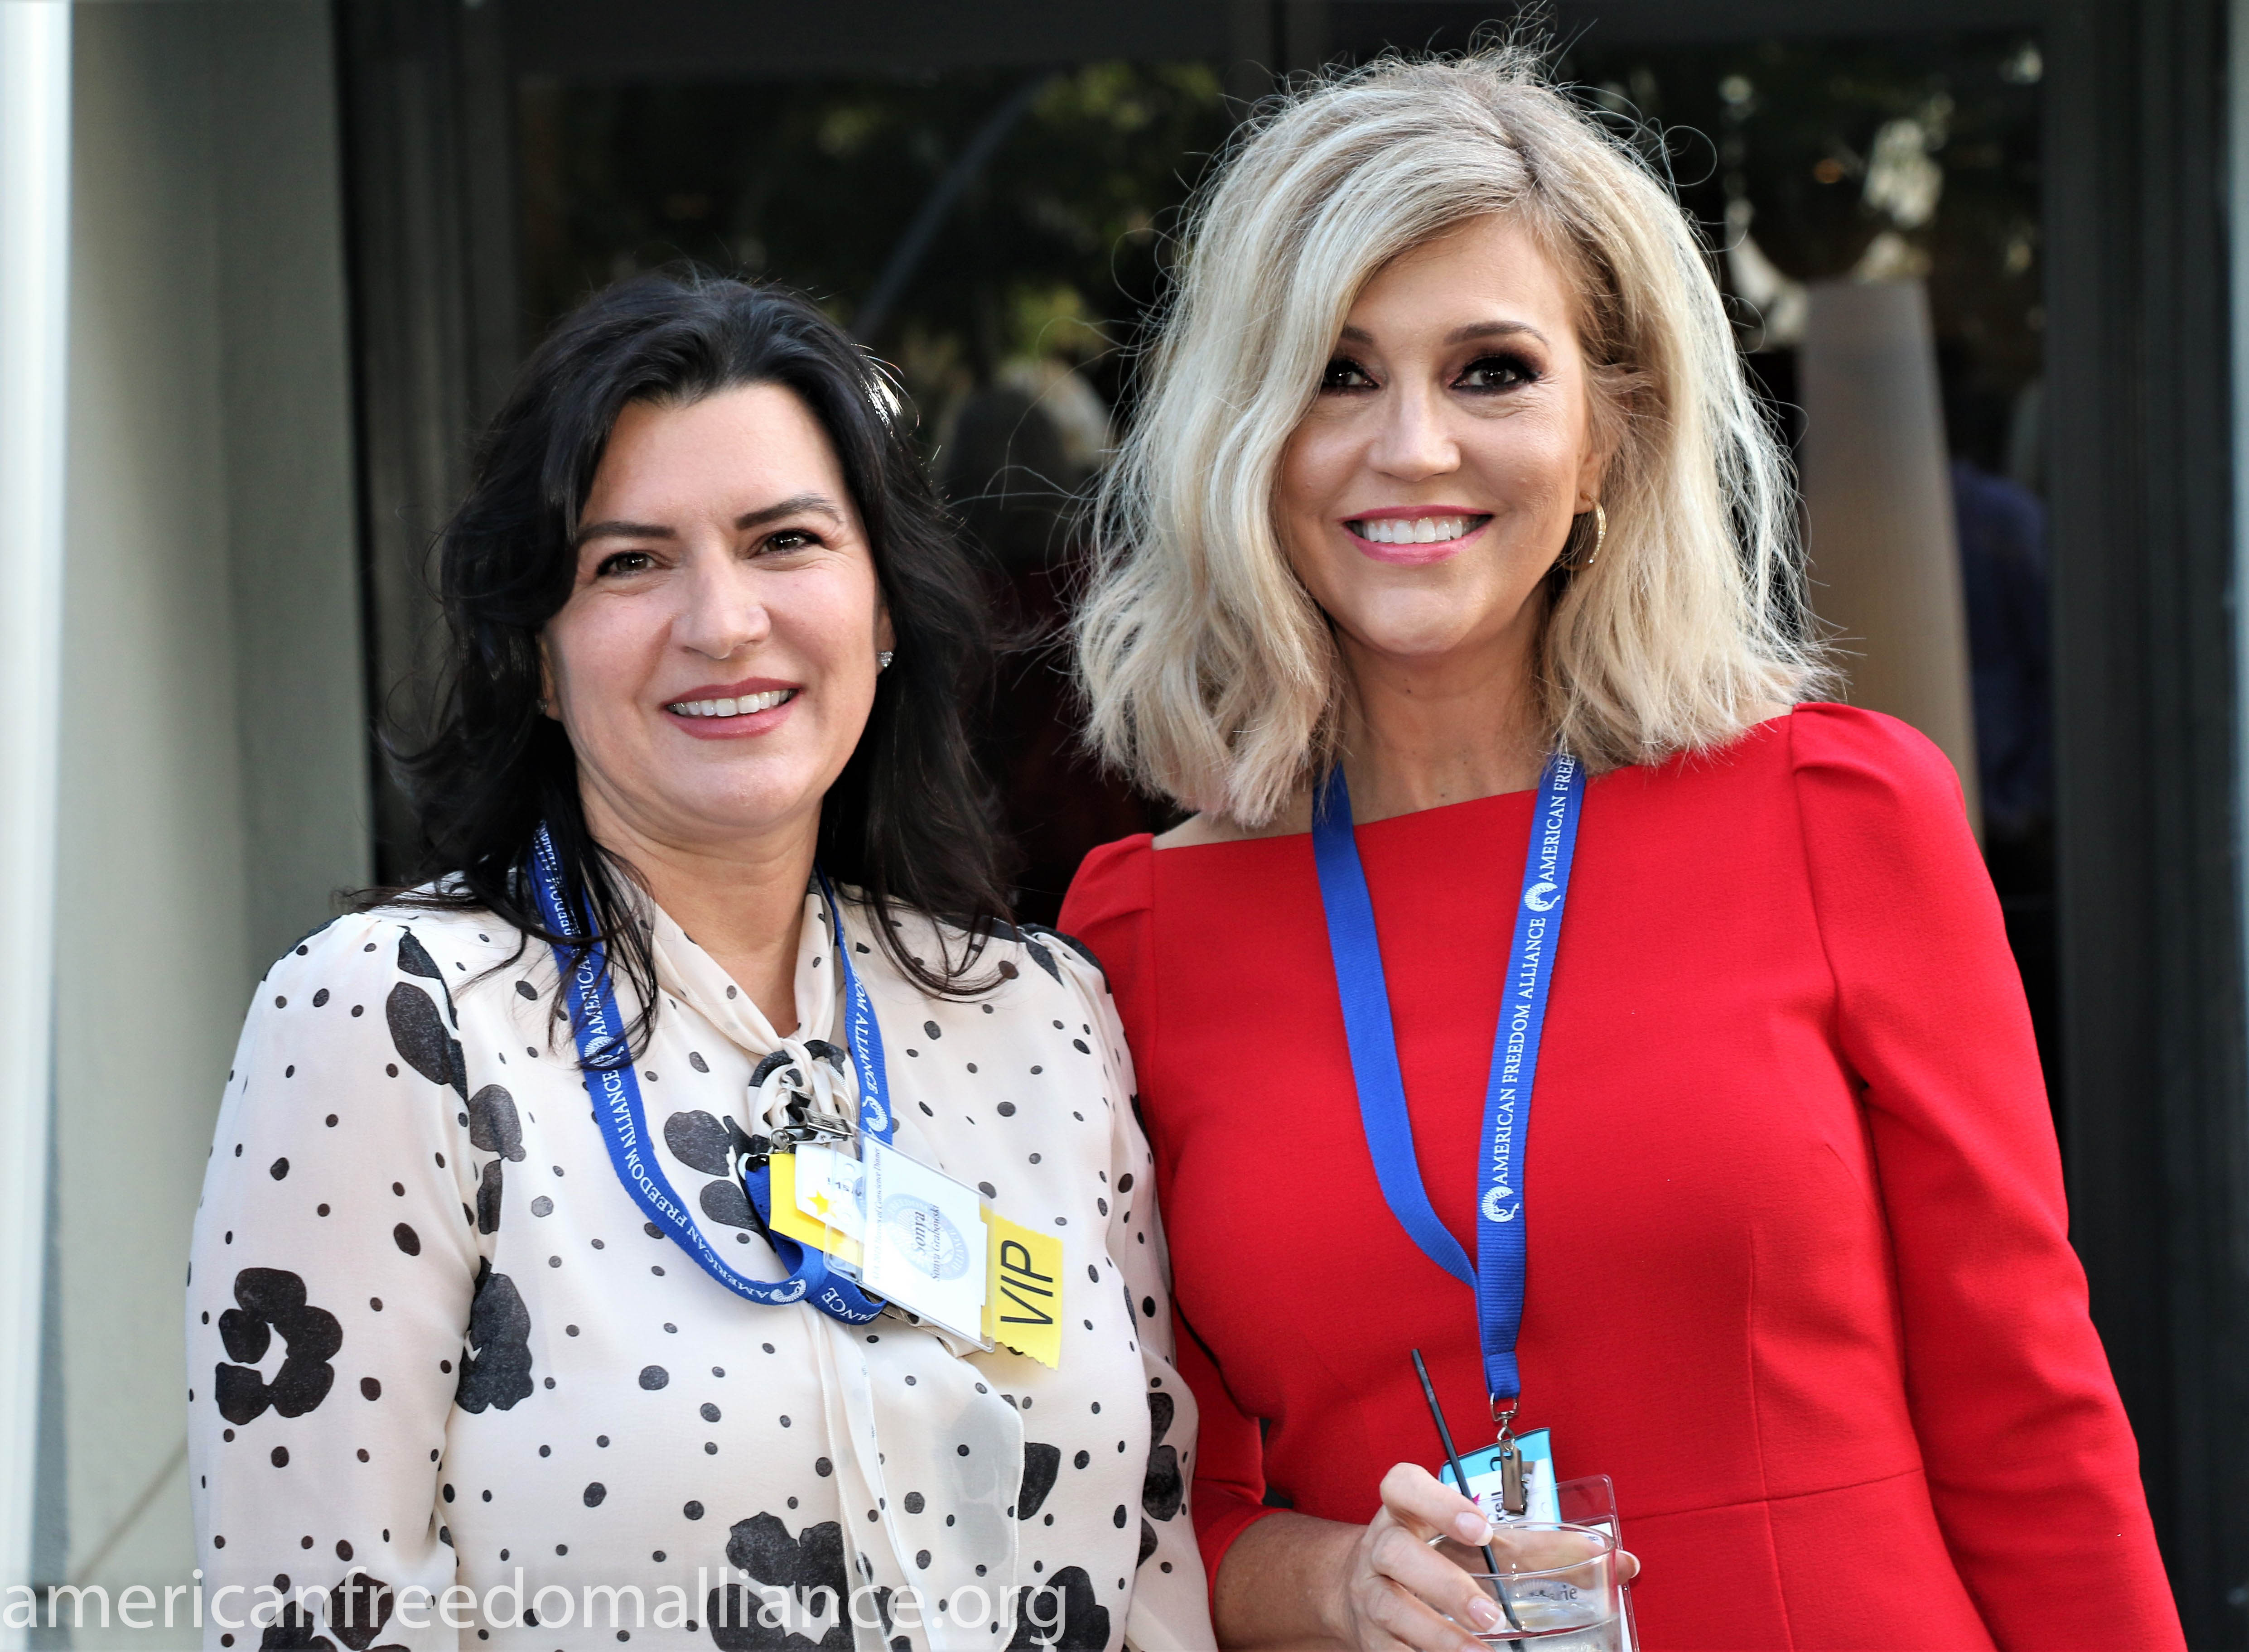 Sonya Grabowski and Ann-Marie Murrell